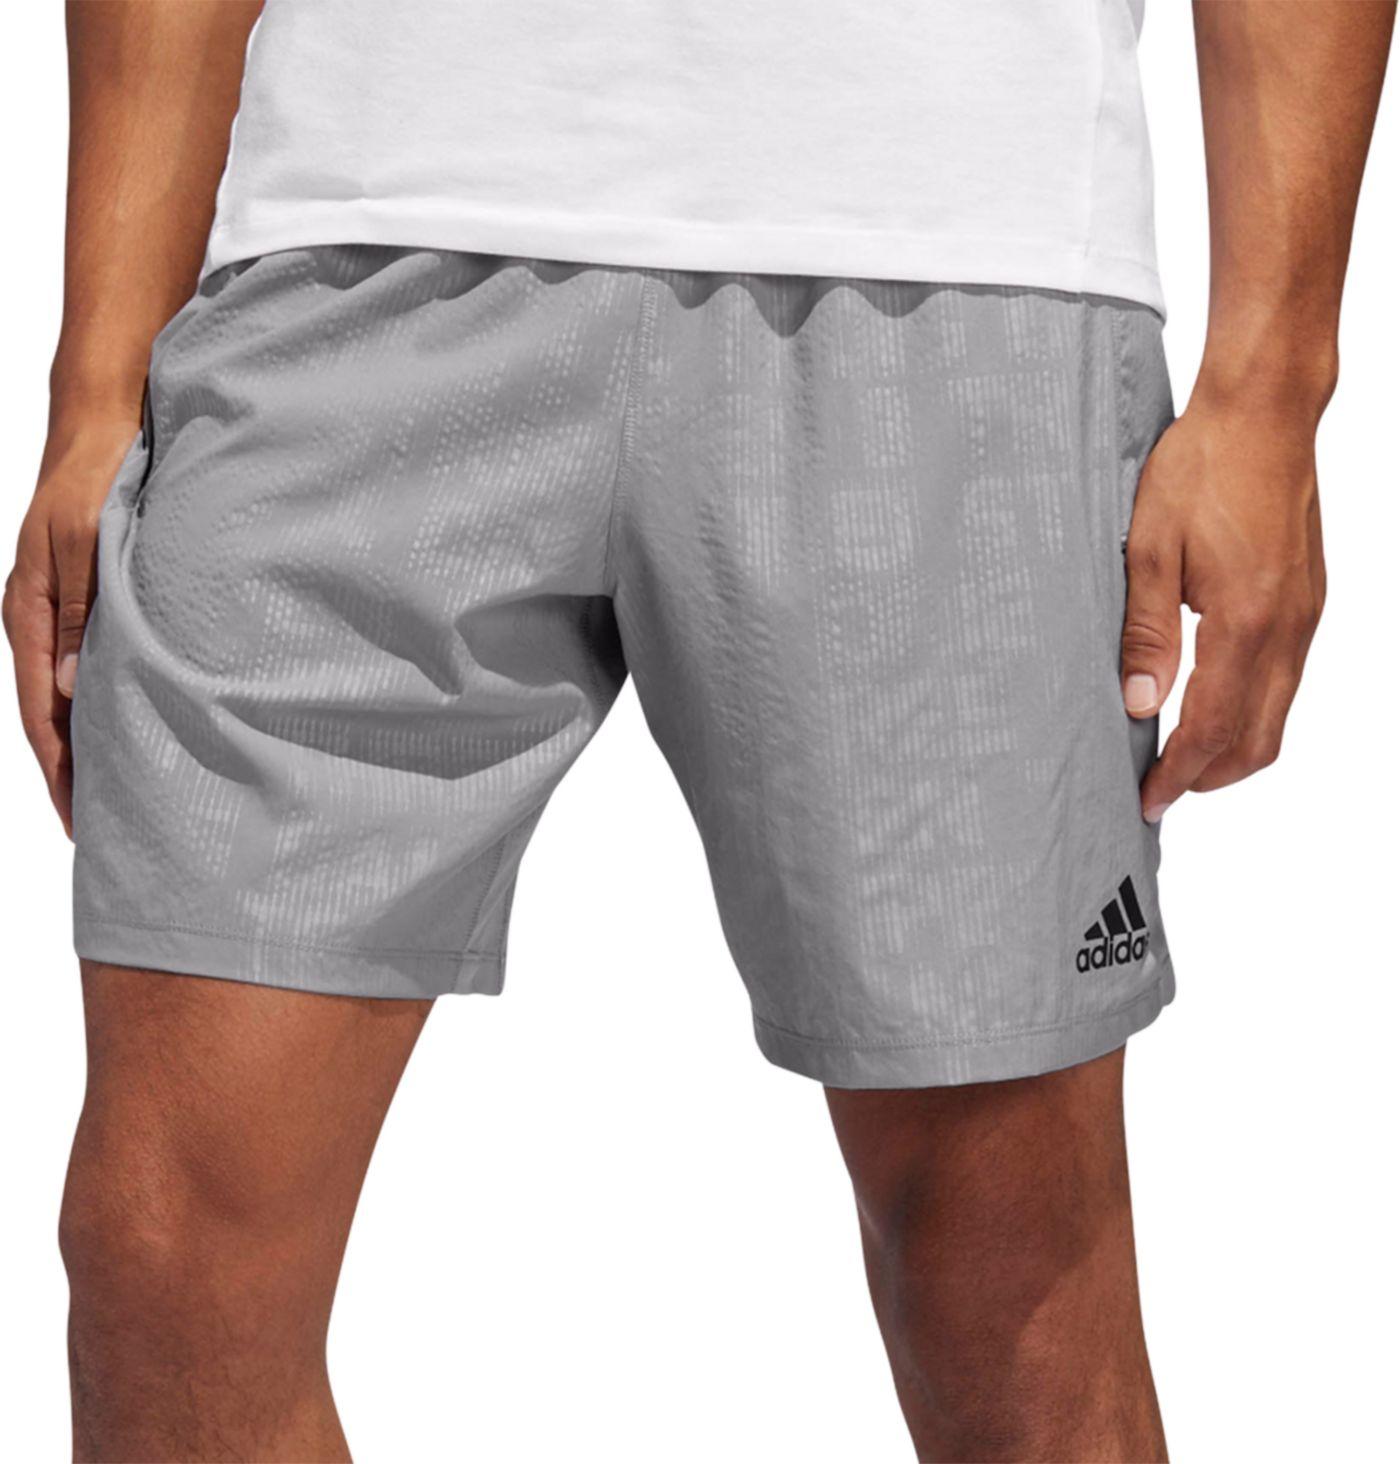 adidas Men's Three Stripe Life 4KRFT All-American Shorts